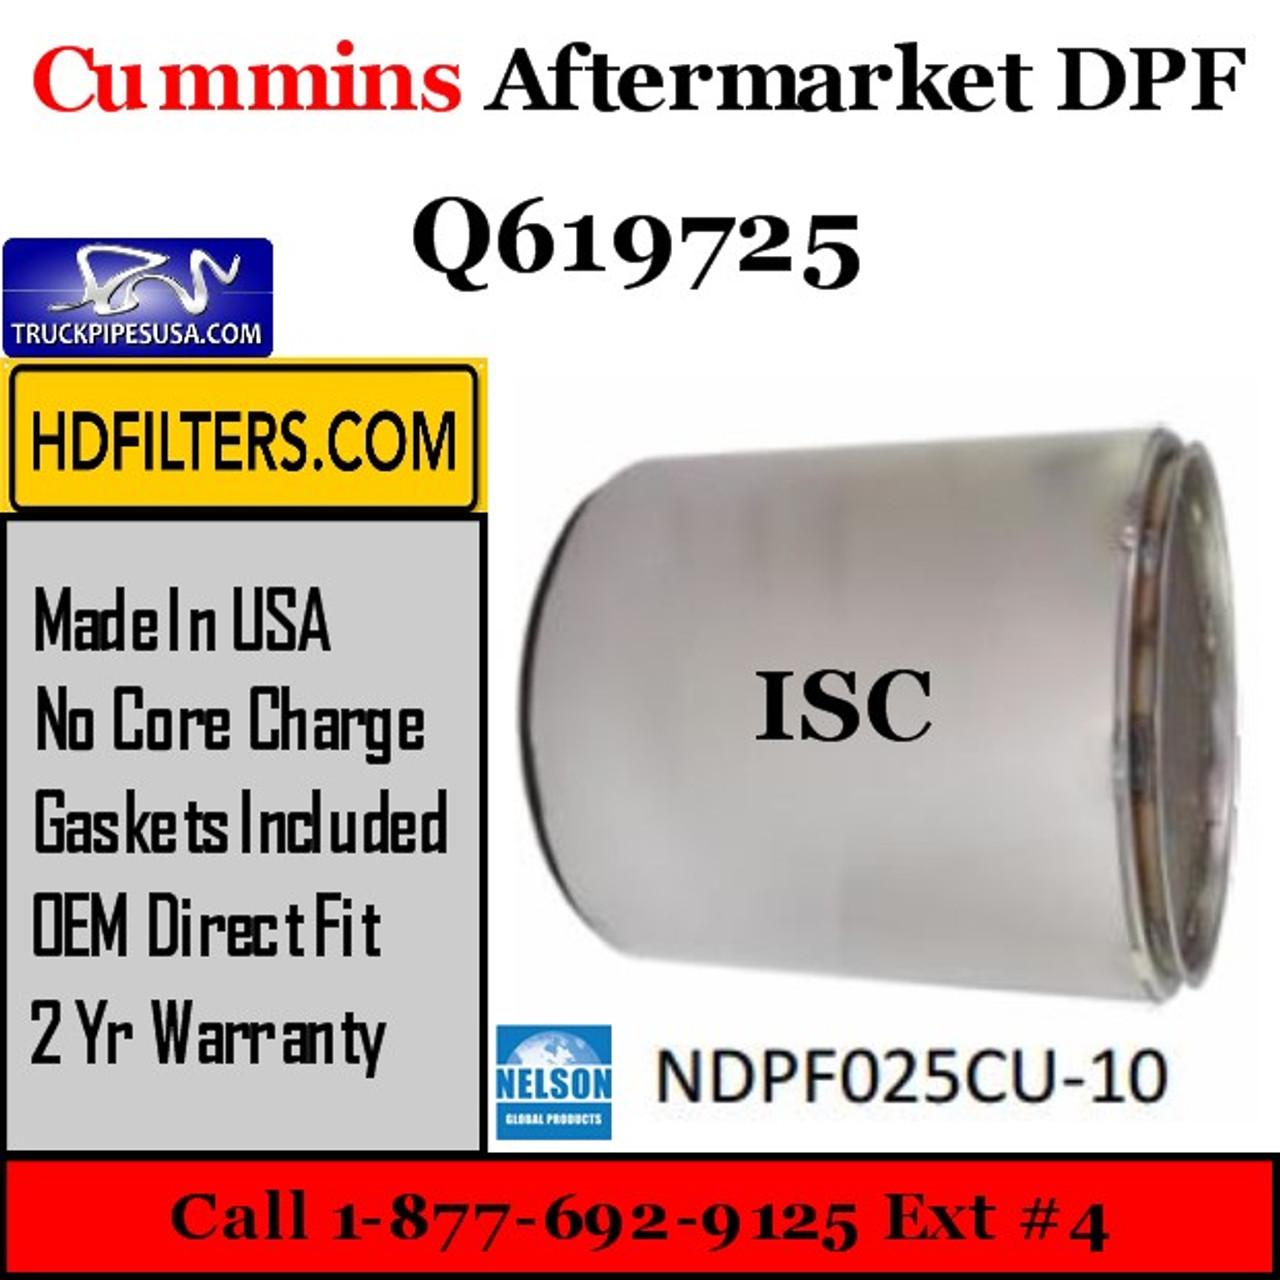 Q619725-NDPF025CU-10 Q619725 Cummins ISC Engine Diesel Particulate Filter DPF